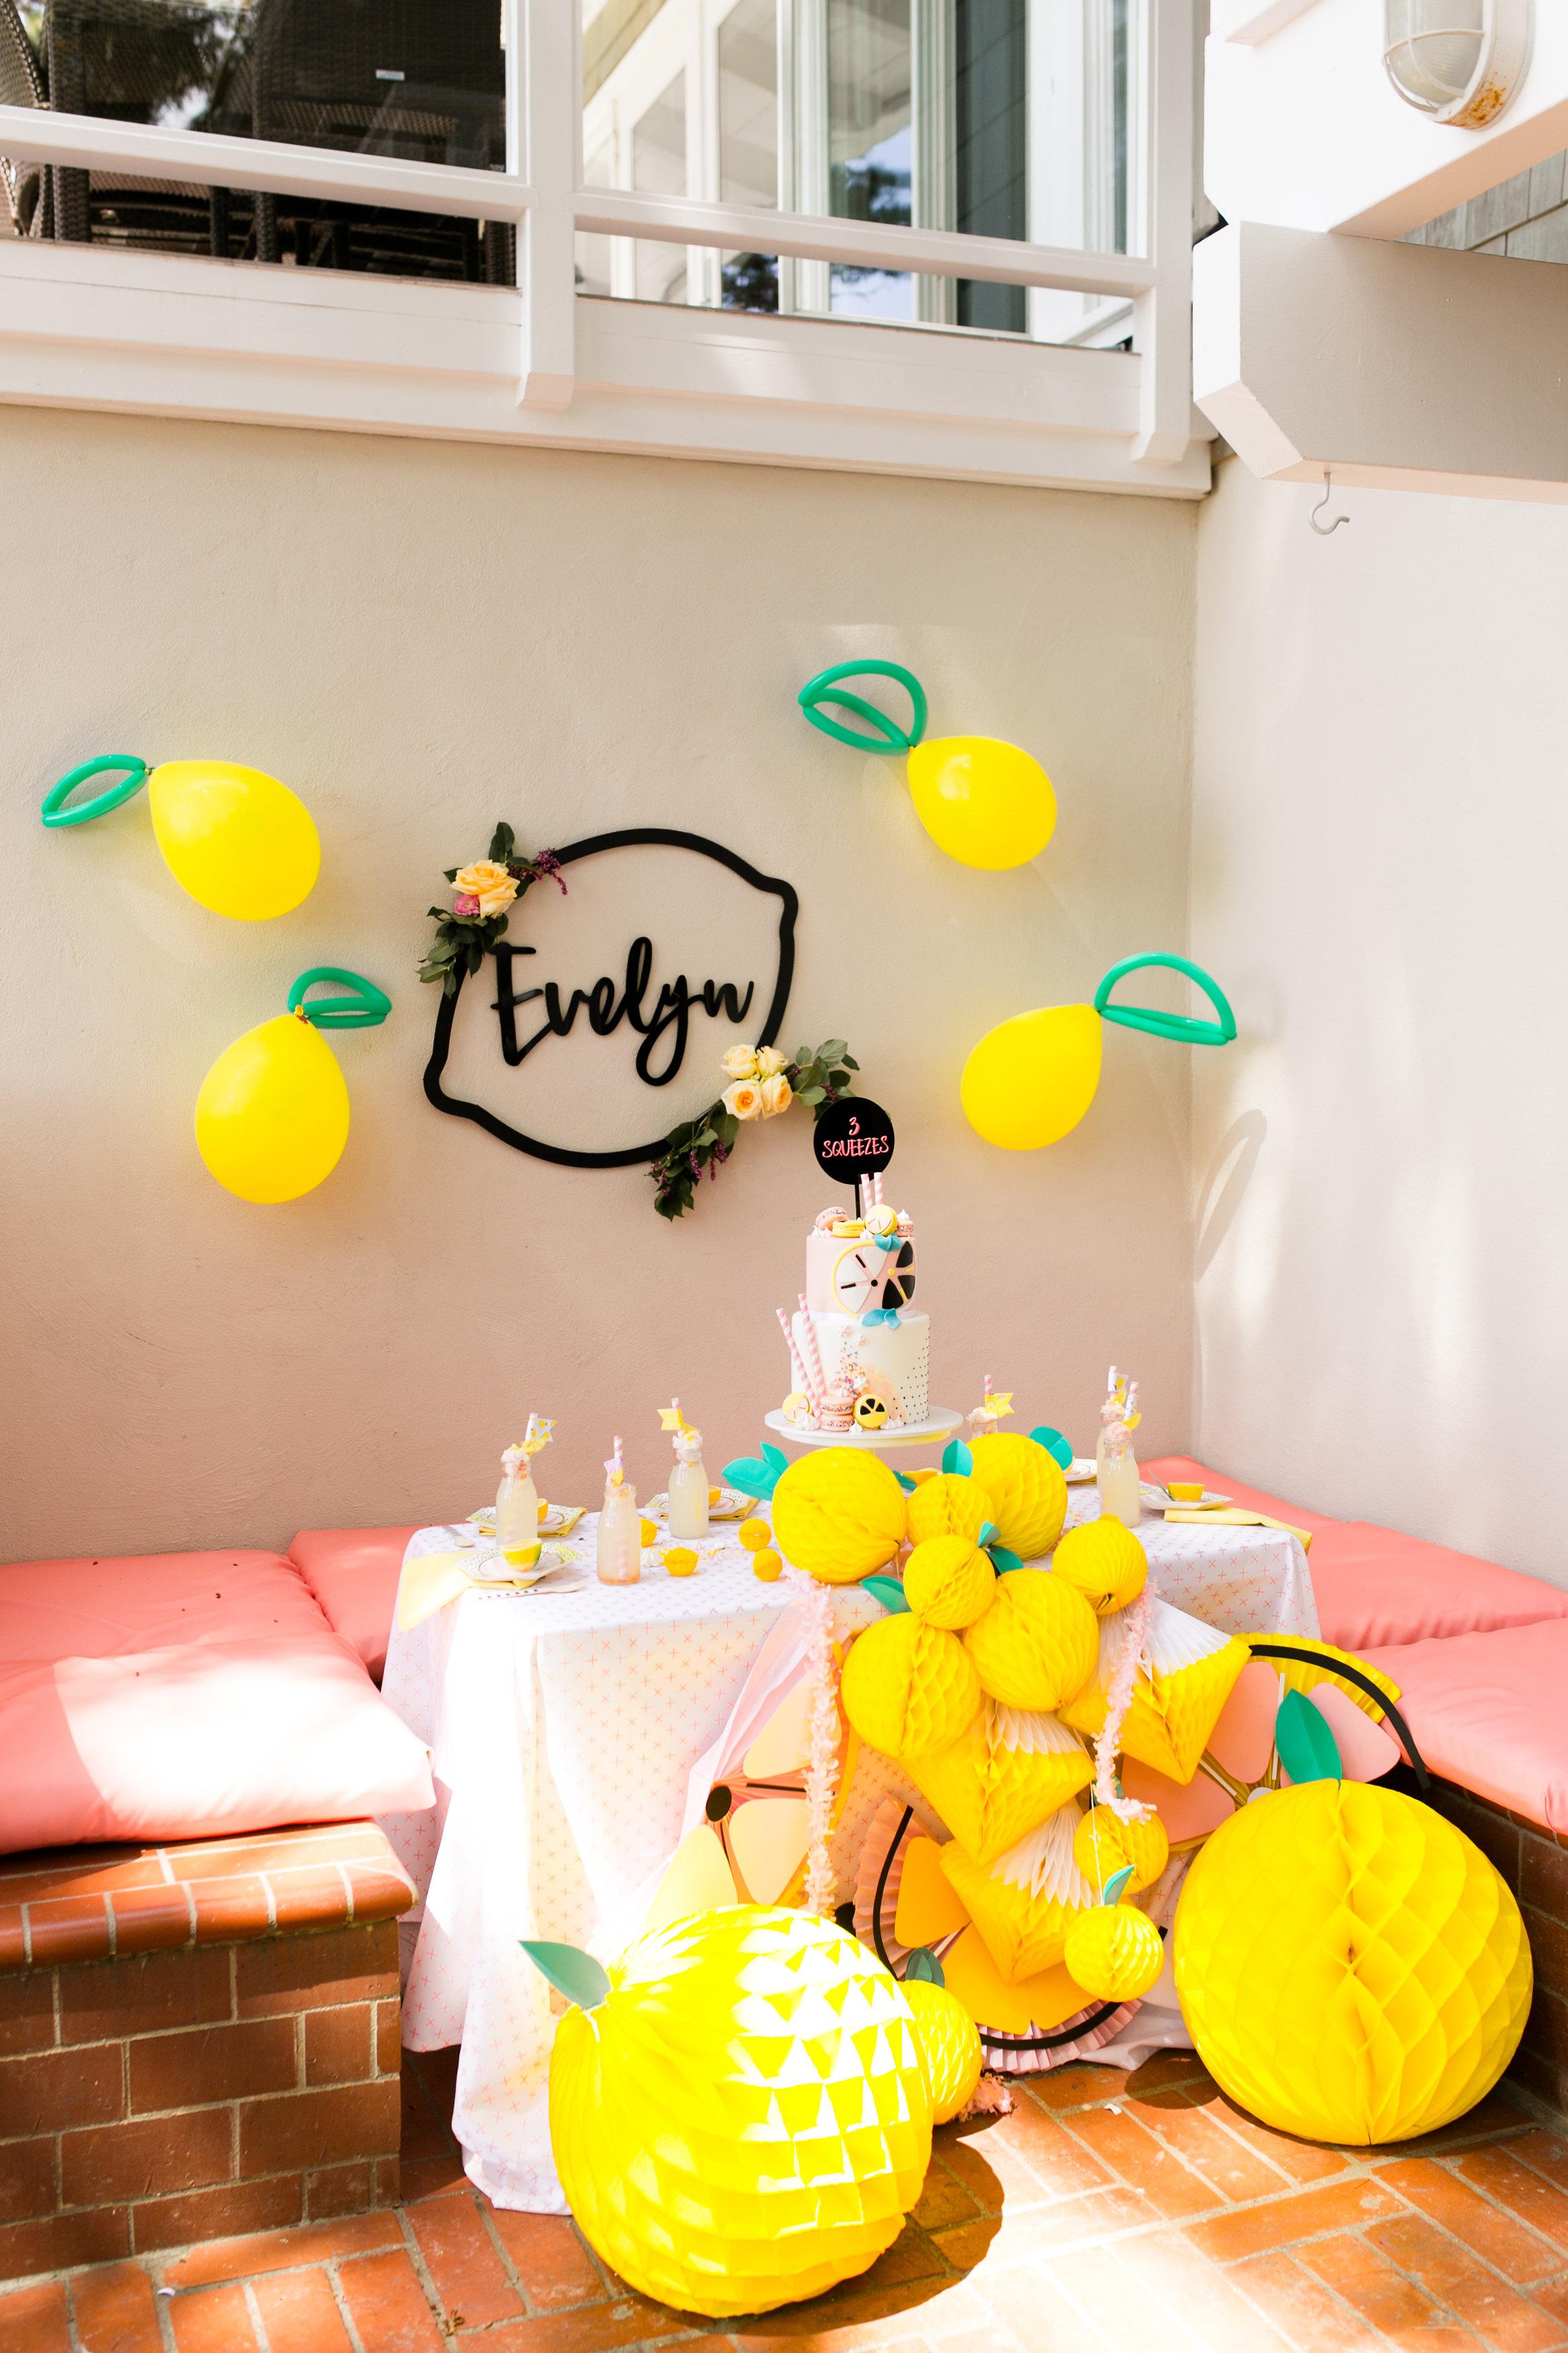 Lemonade Kids Birthday Party - Kids tabletop Decor and Backdrop for lemons